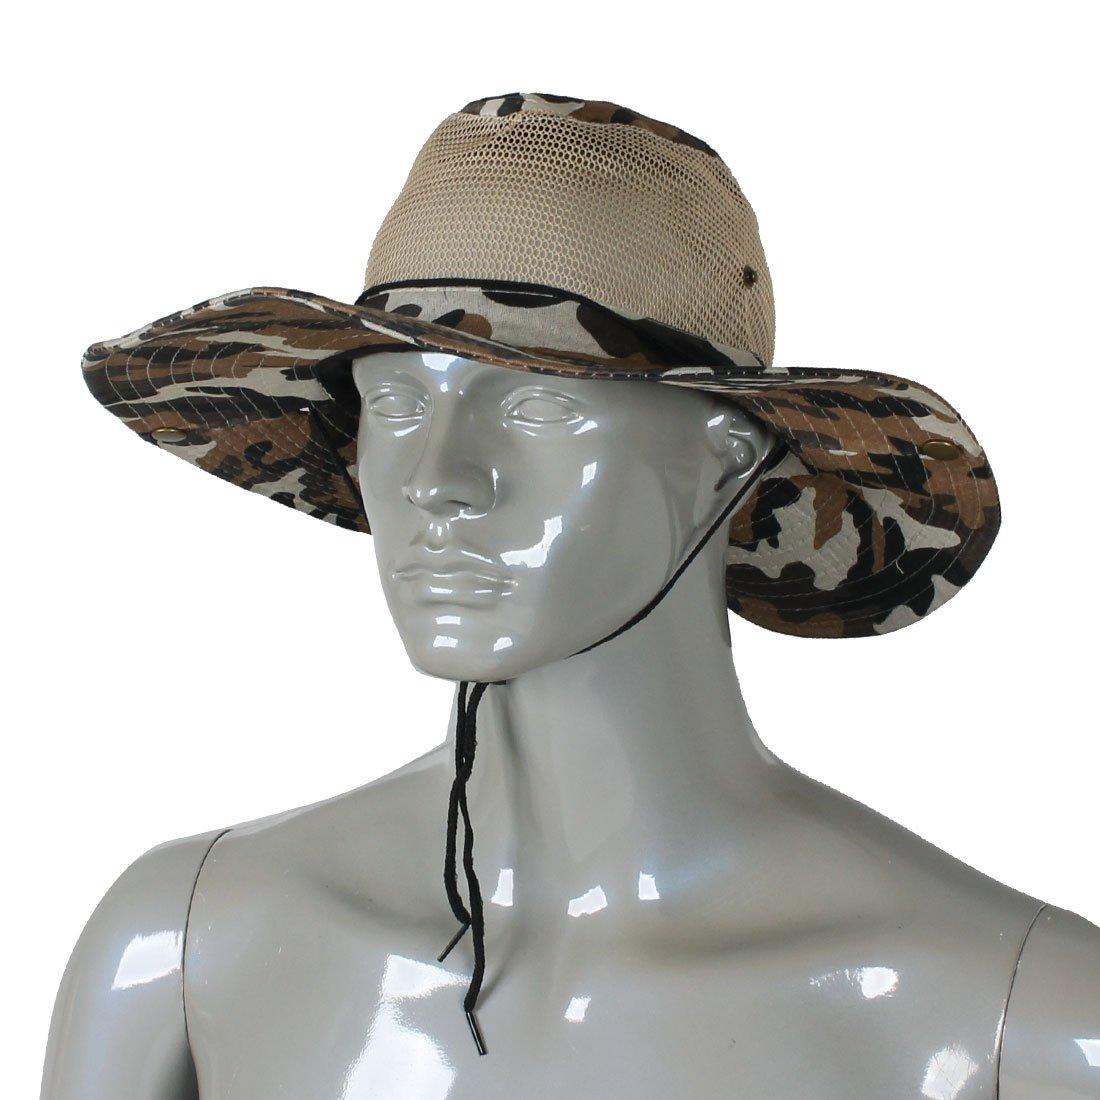 2017 NEW Men Wide Full Brim Camouflage Mesh Design Fishing Hat Cap